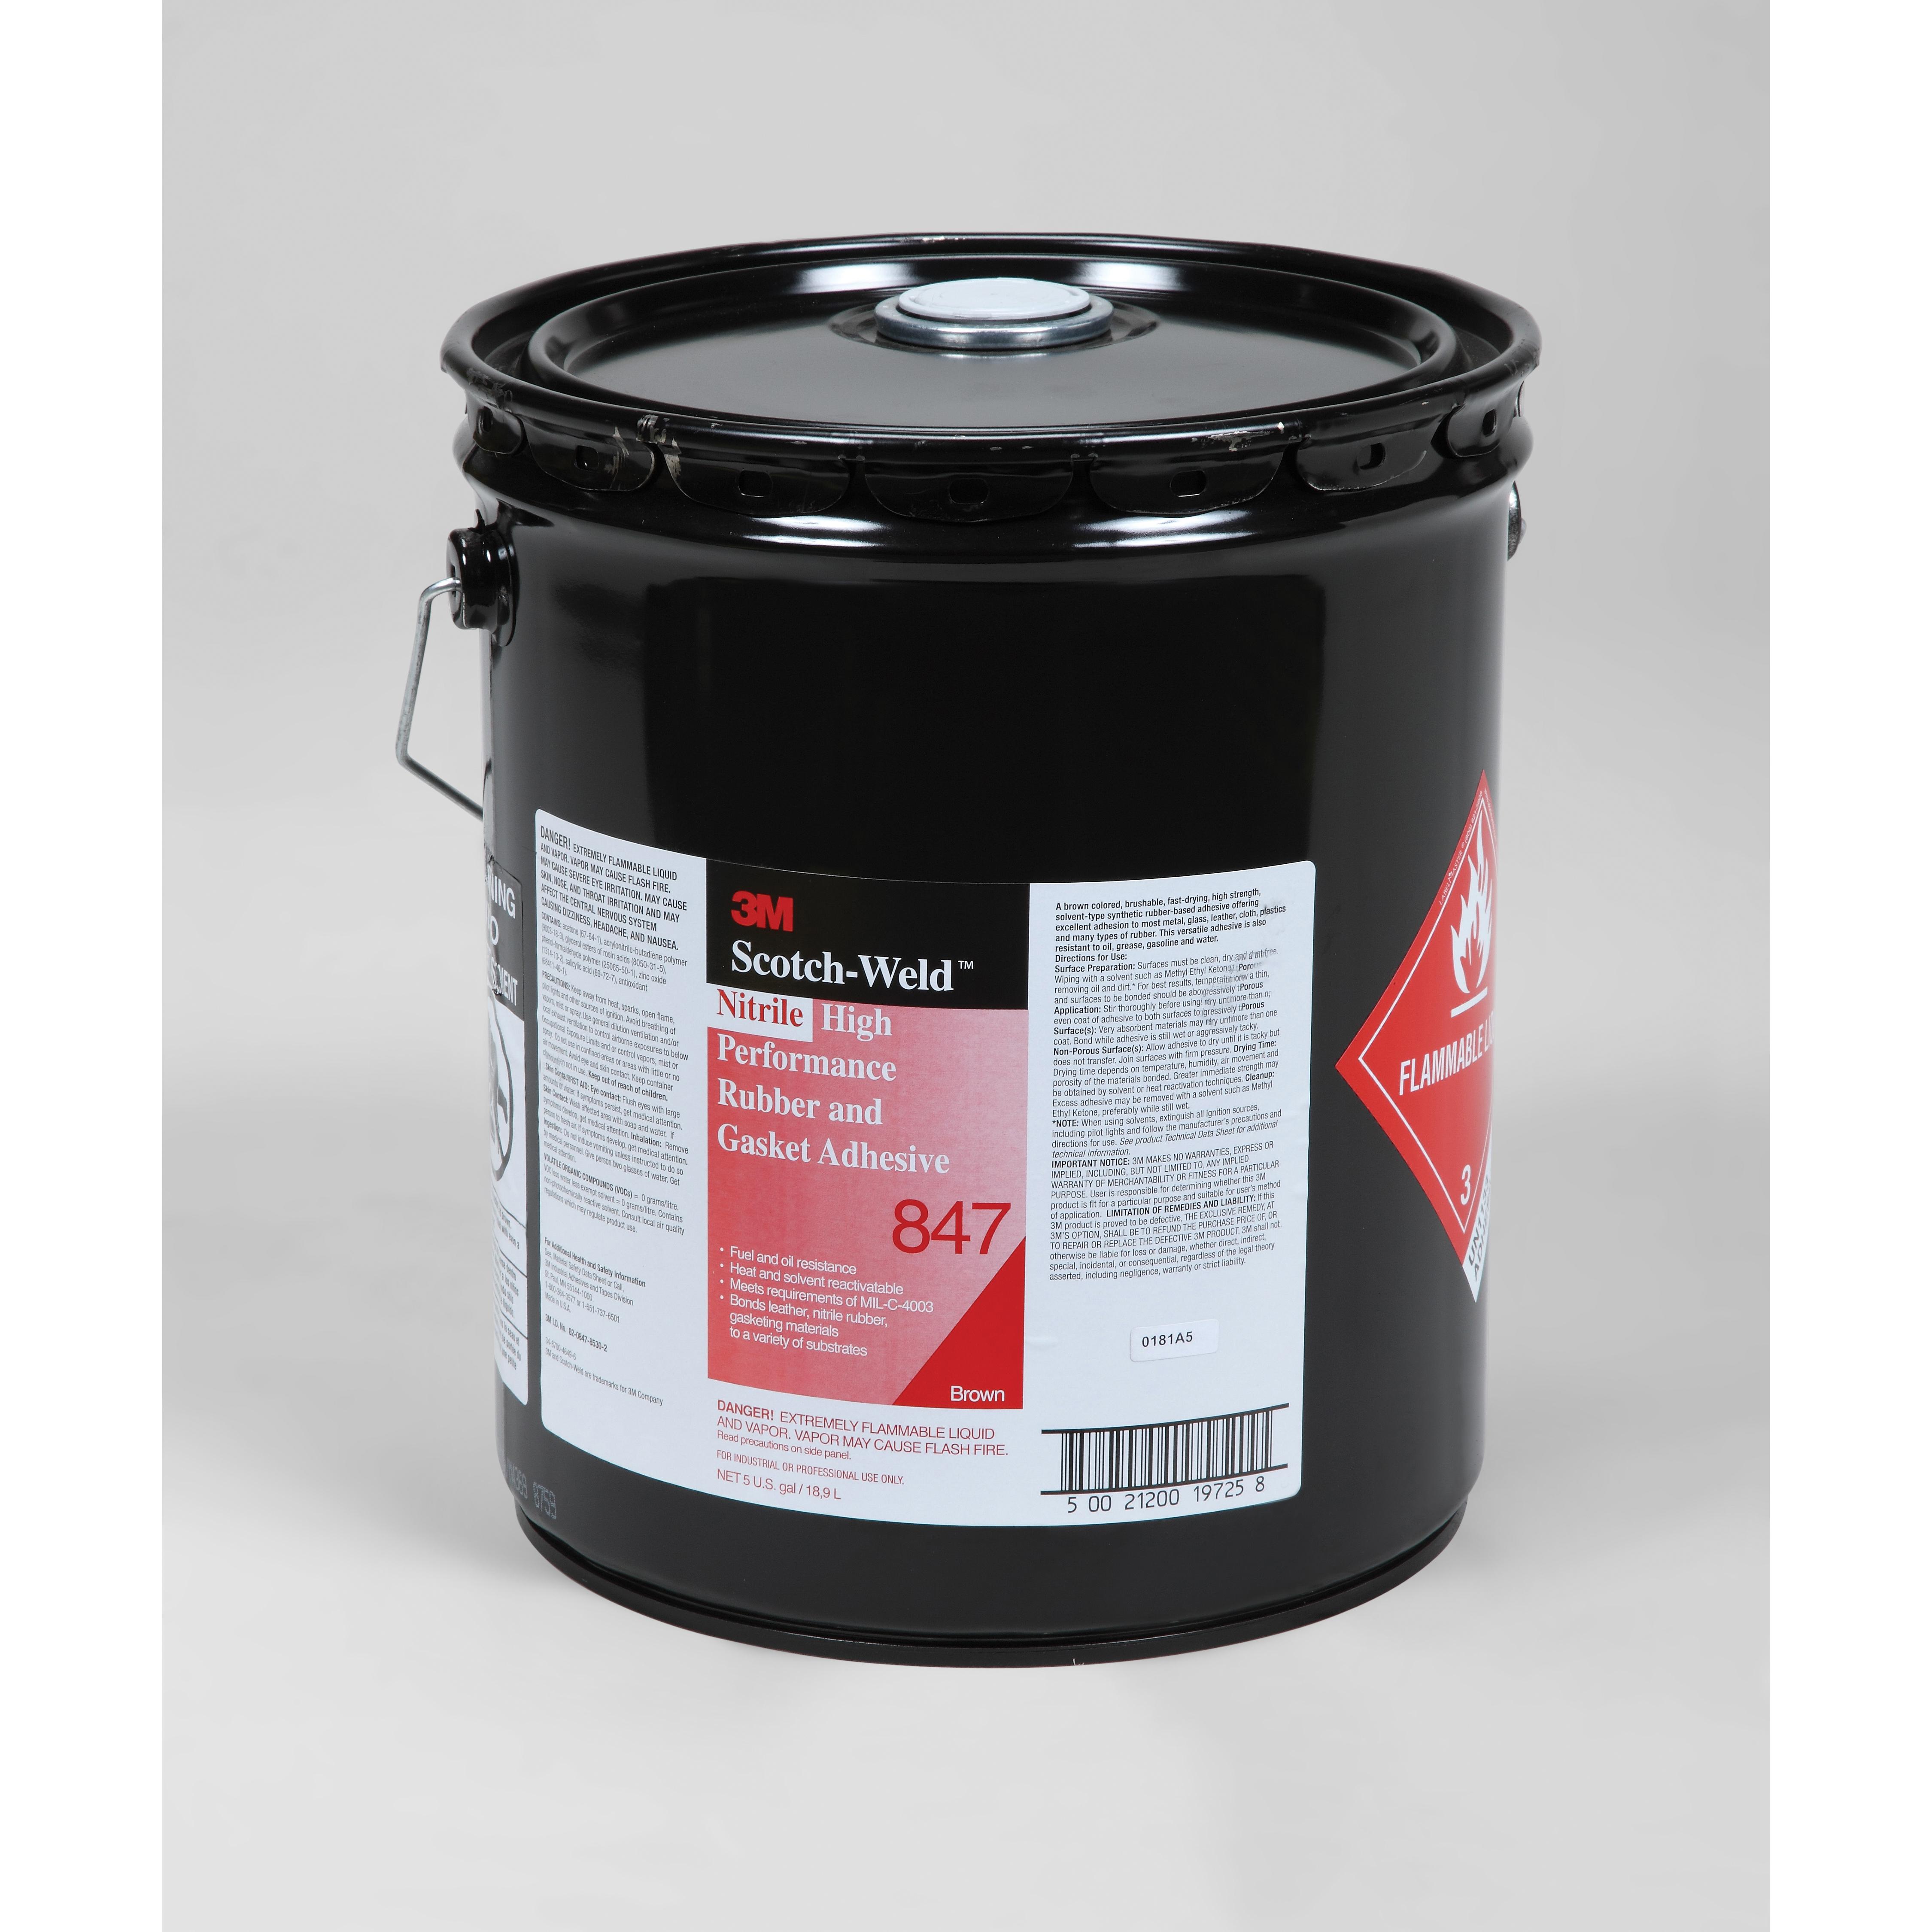 LA-CO® 011175 PIPETITE-STIK® Non-Toxic Thread Sealant, 1.25 oz Paperboard Holder, White